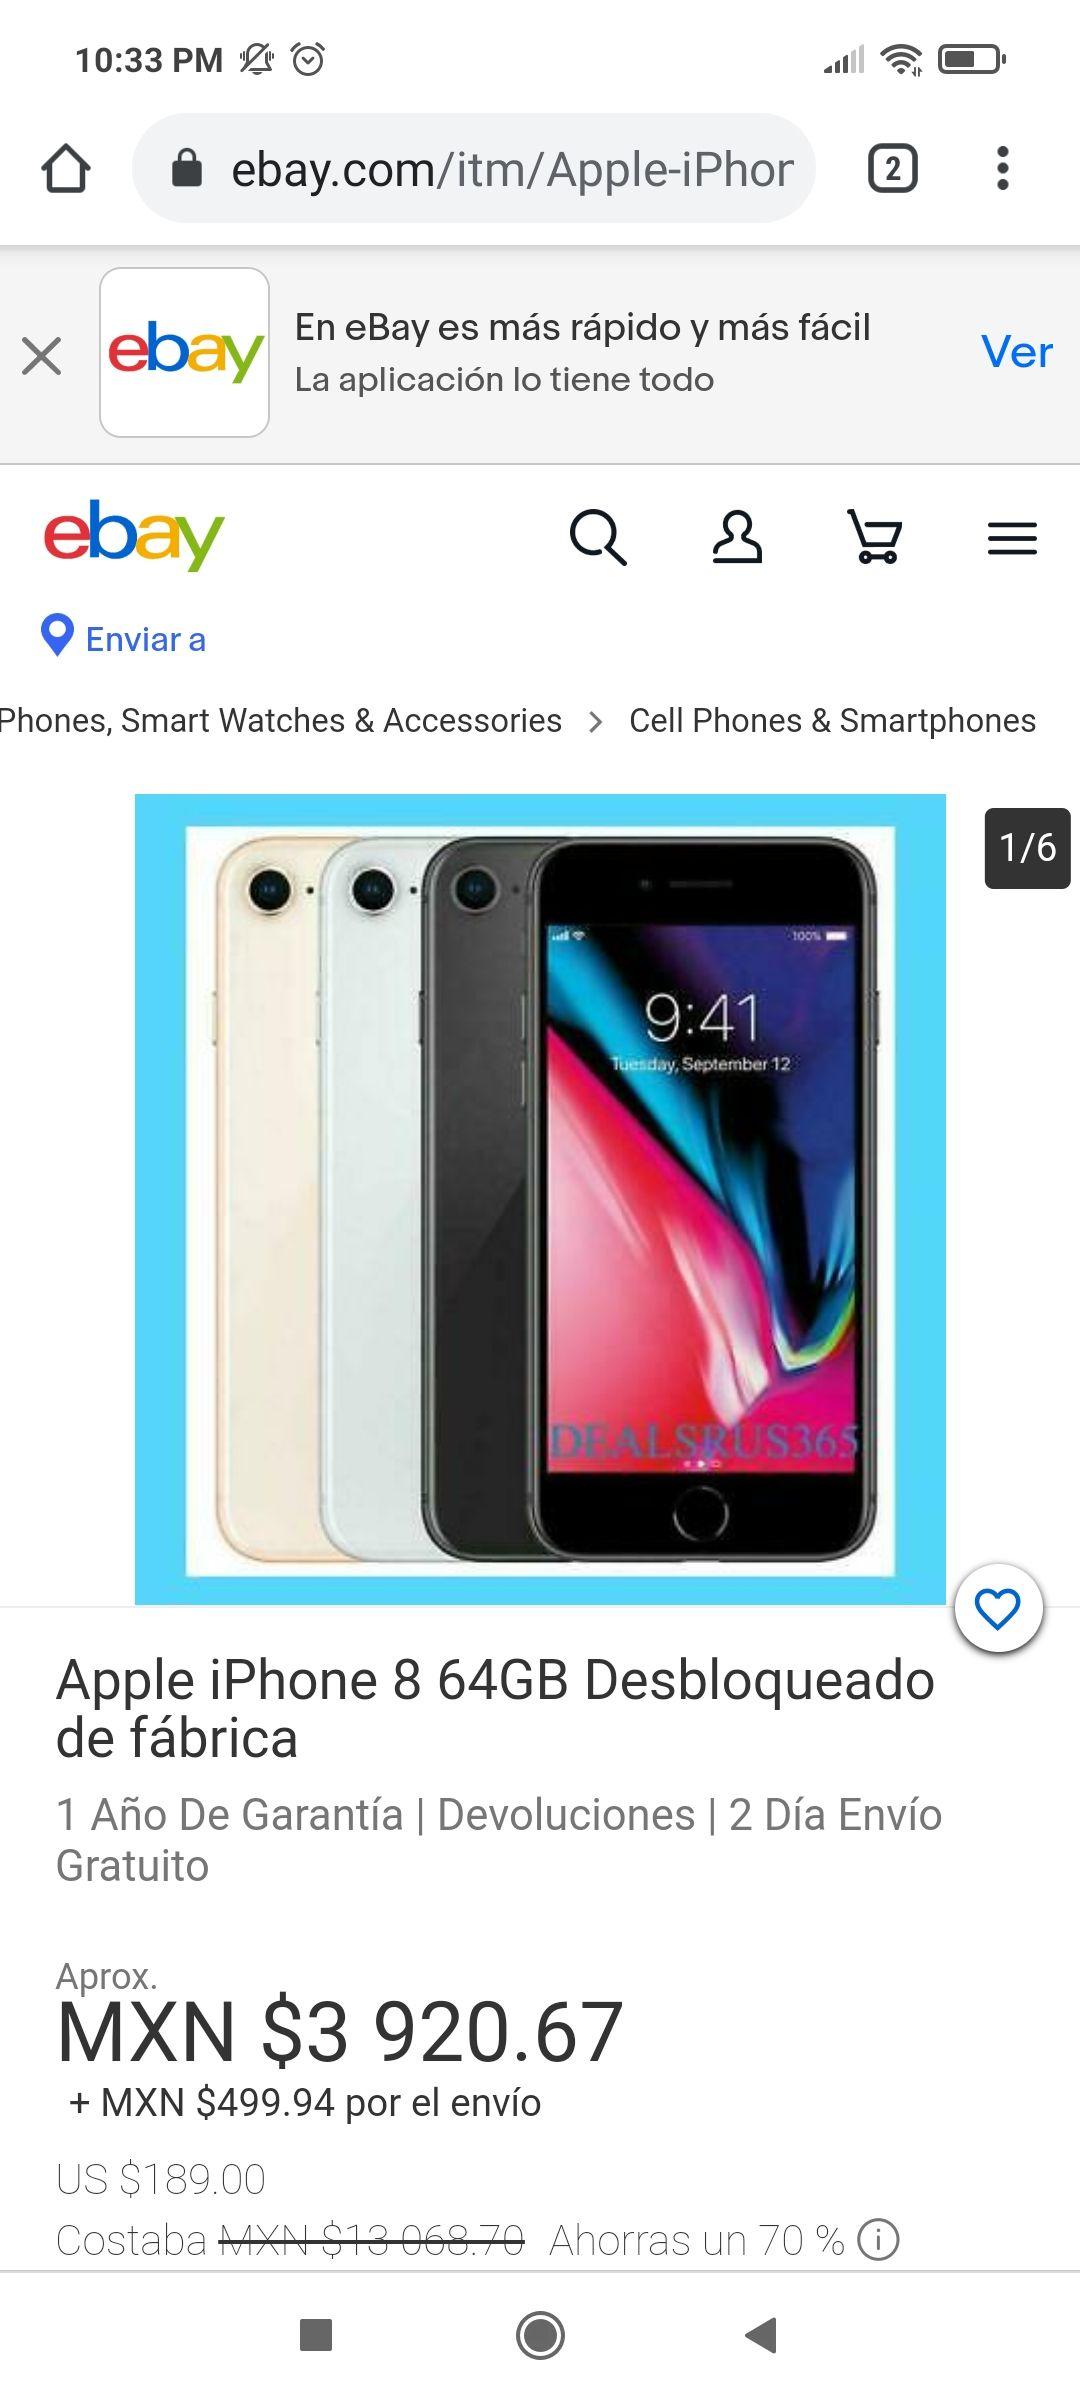 ebay: iPhone 8 64GB renewed